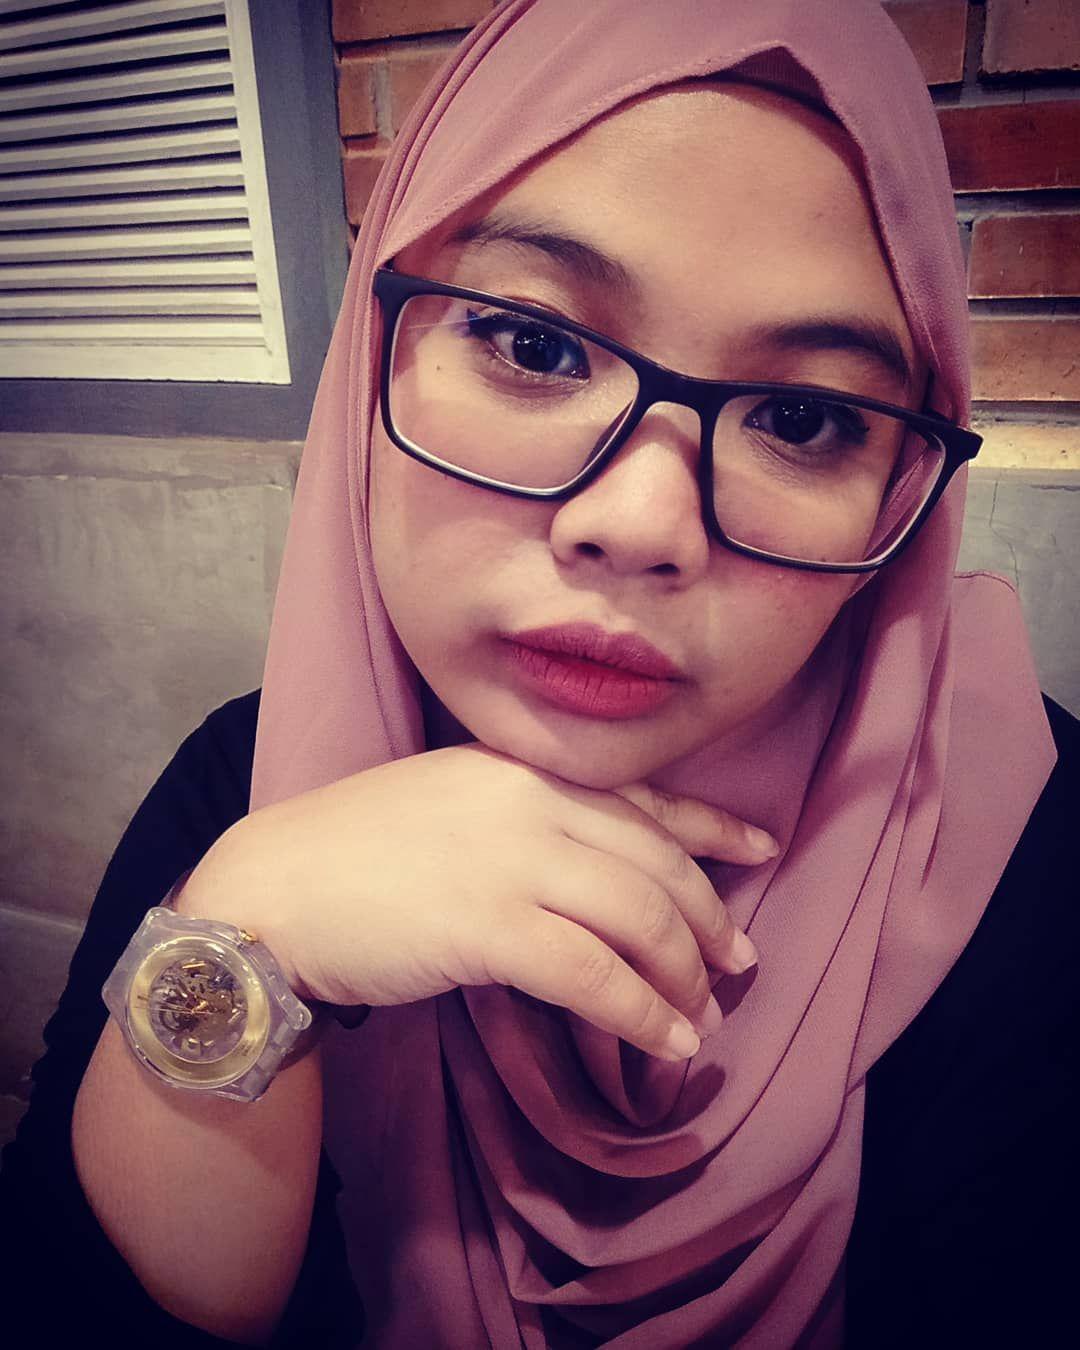 Percayalah Muka Pulus Dan Putih Hanya Karena Aplikasi Hp Yg Canggih Selfie Kece Instaday Instagirls Swatch Cantik Sedihdigitu Fashion Swatch Hijab